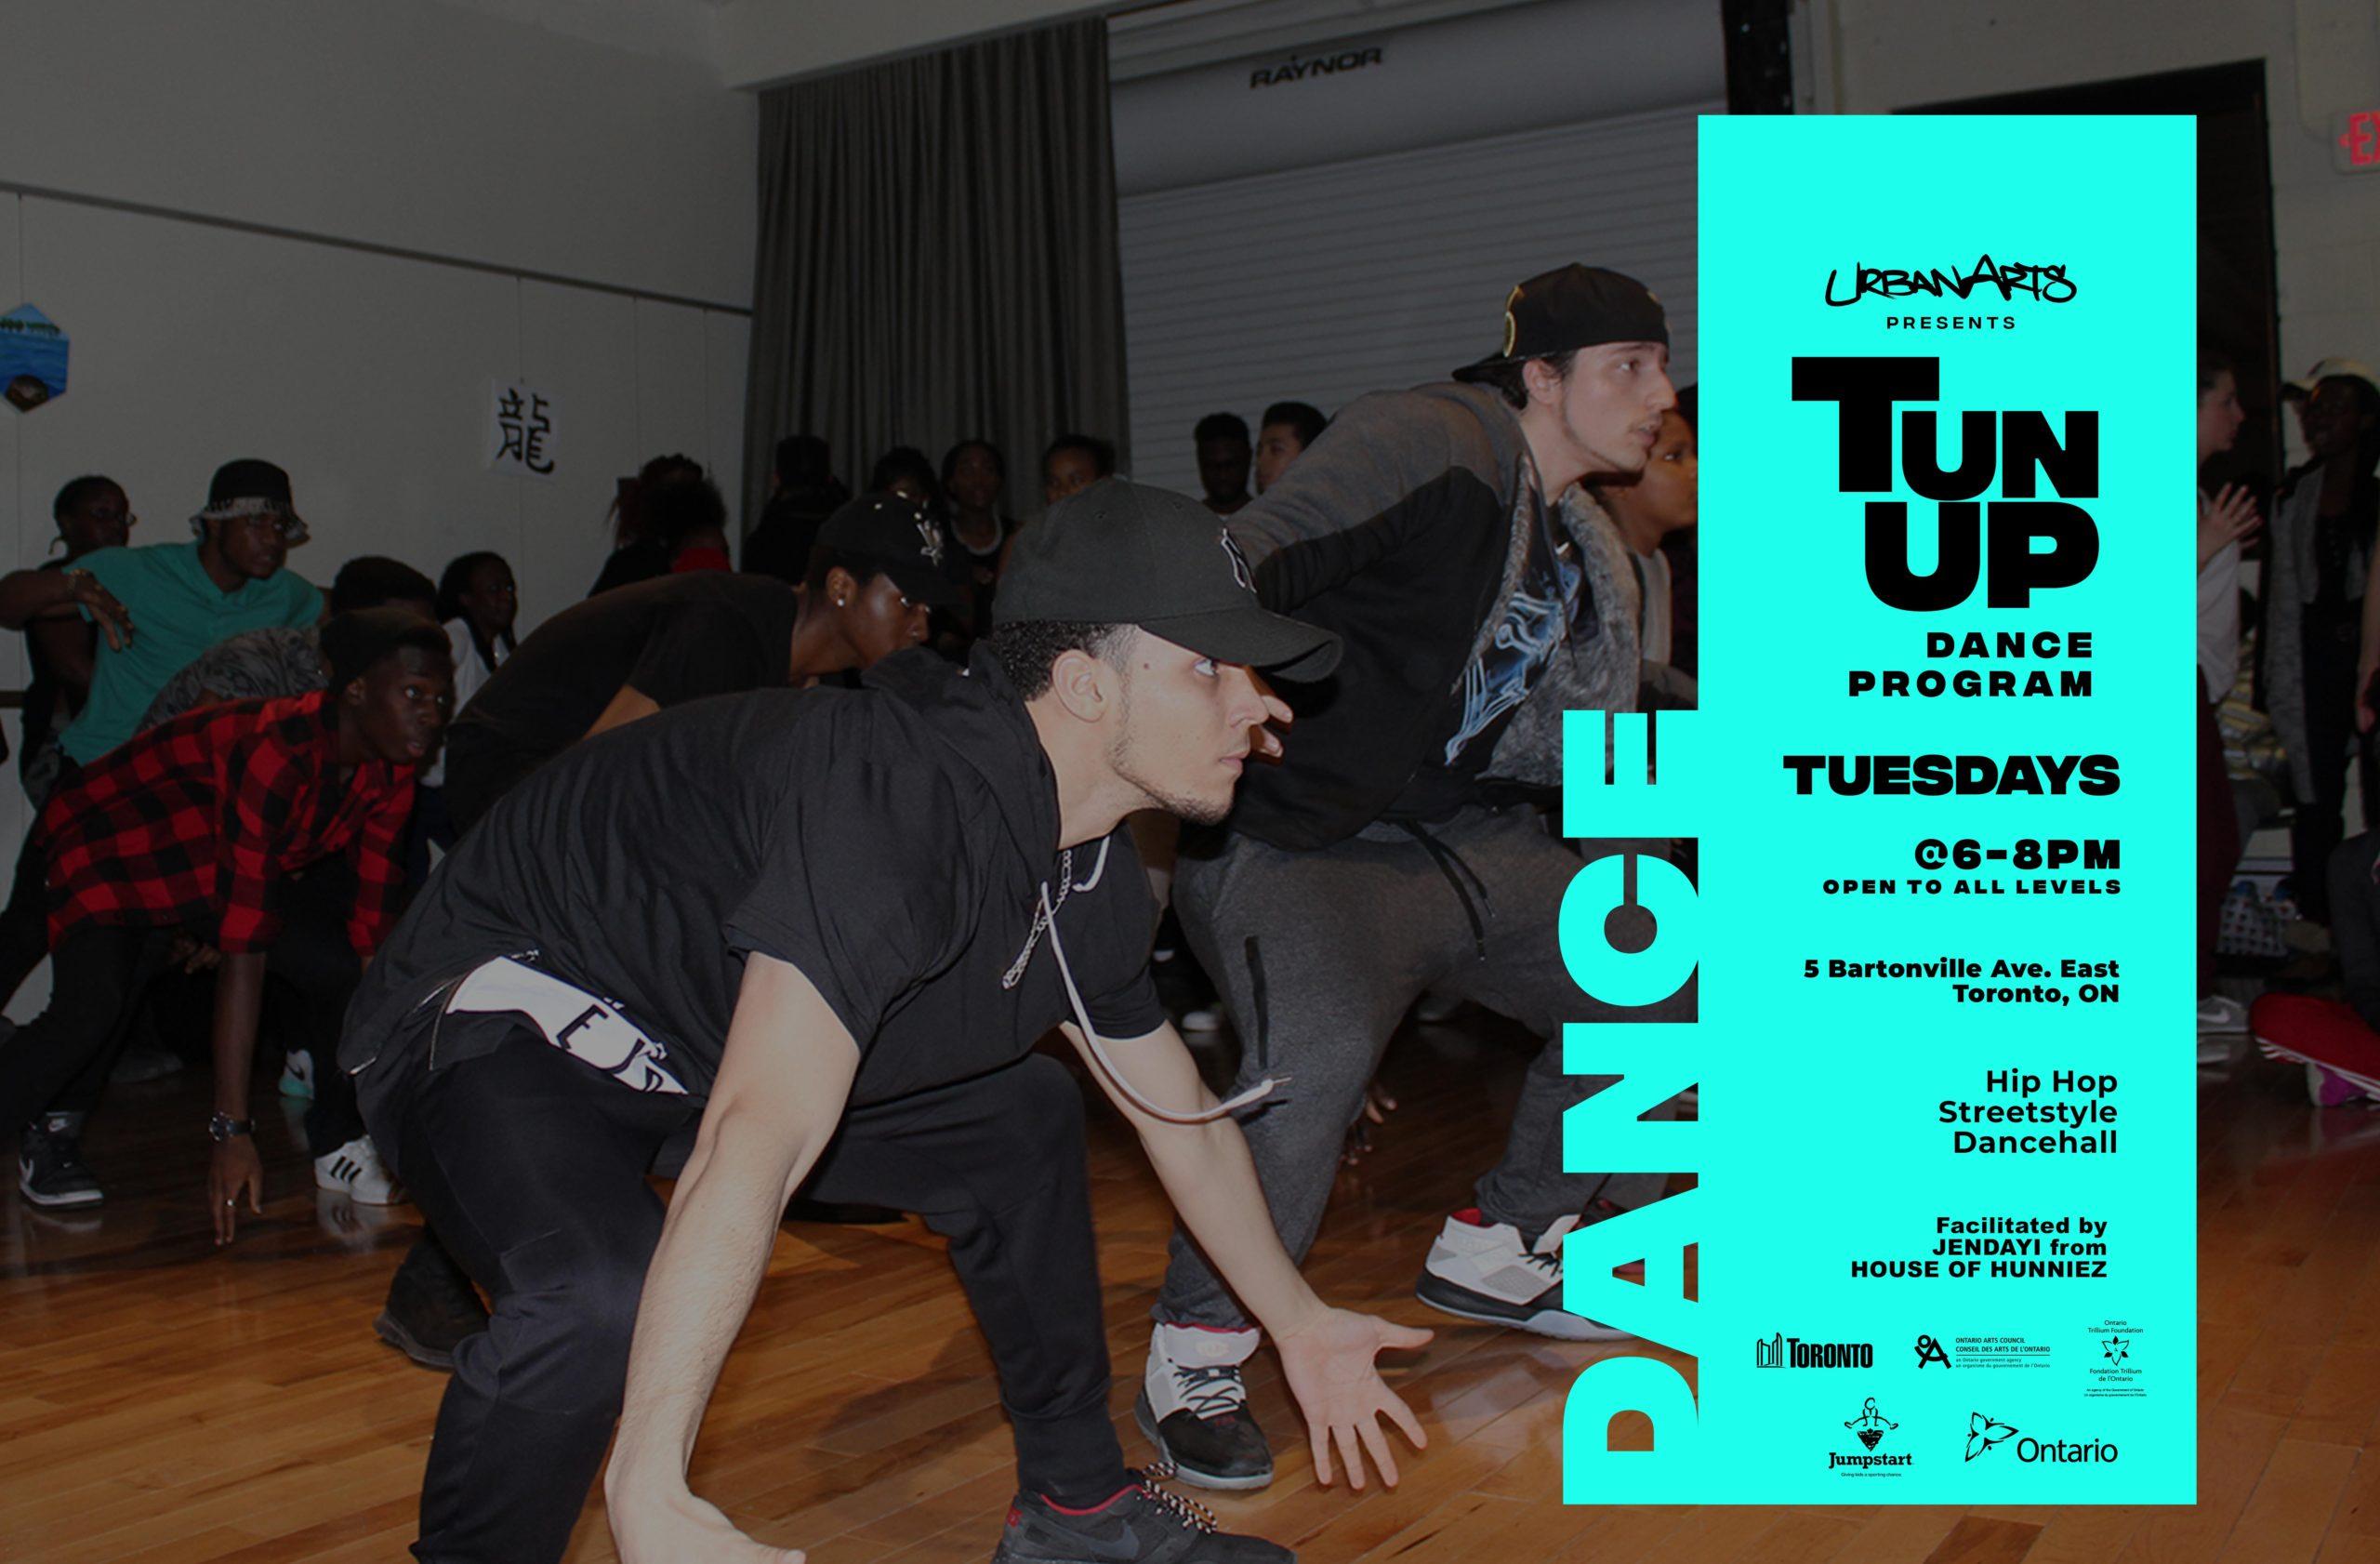 Artscape Weston Common UrbanArts Tun up Dance Program